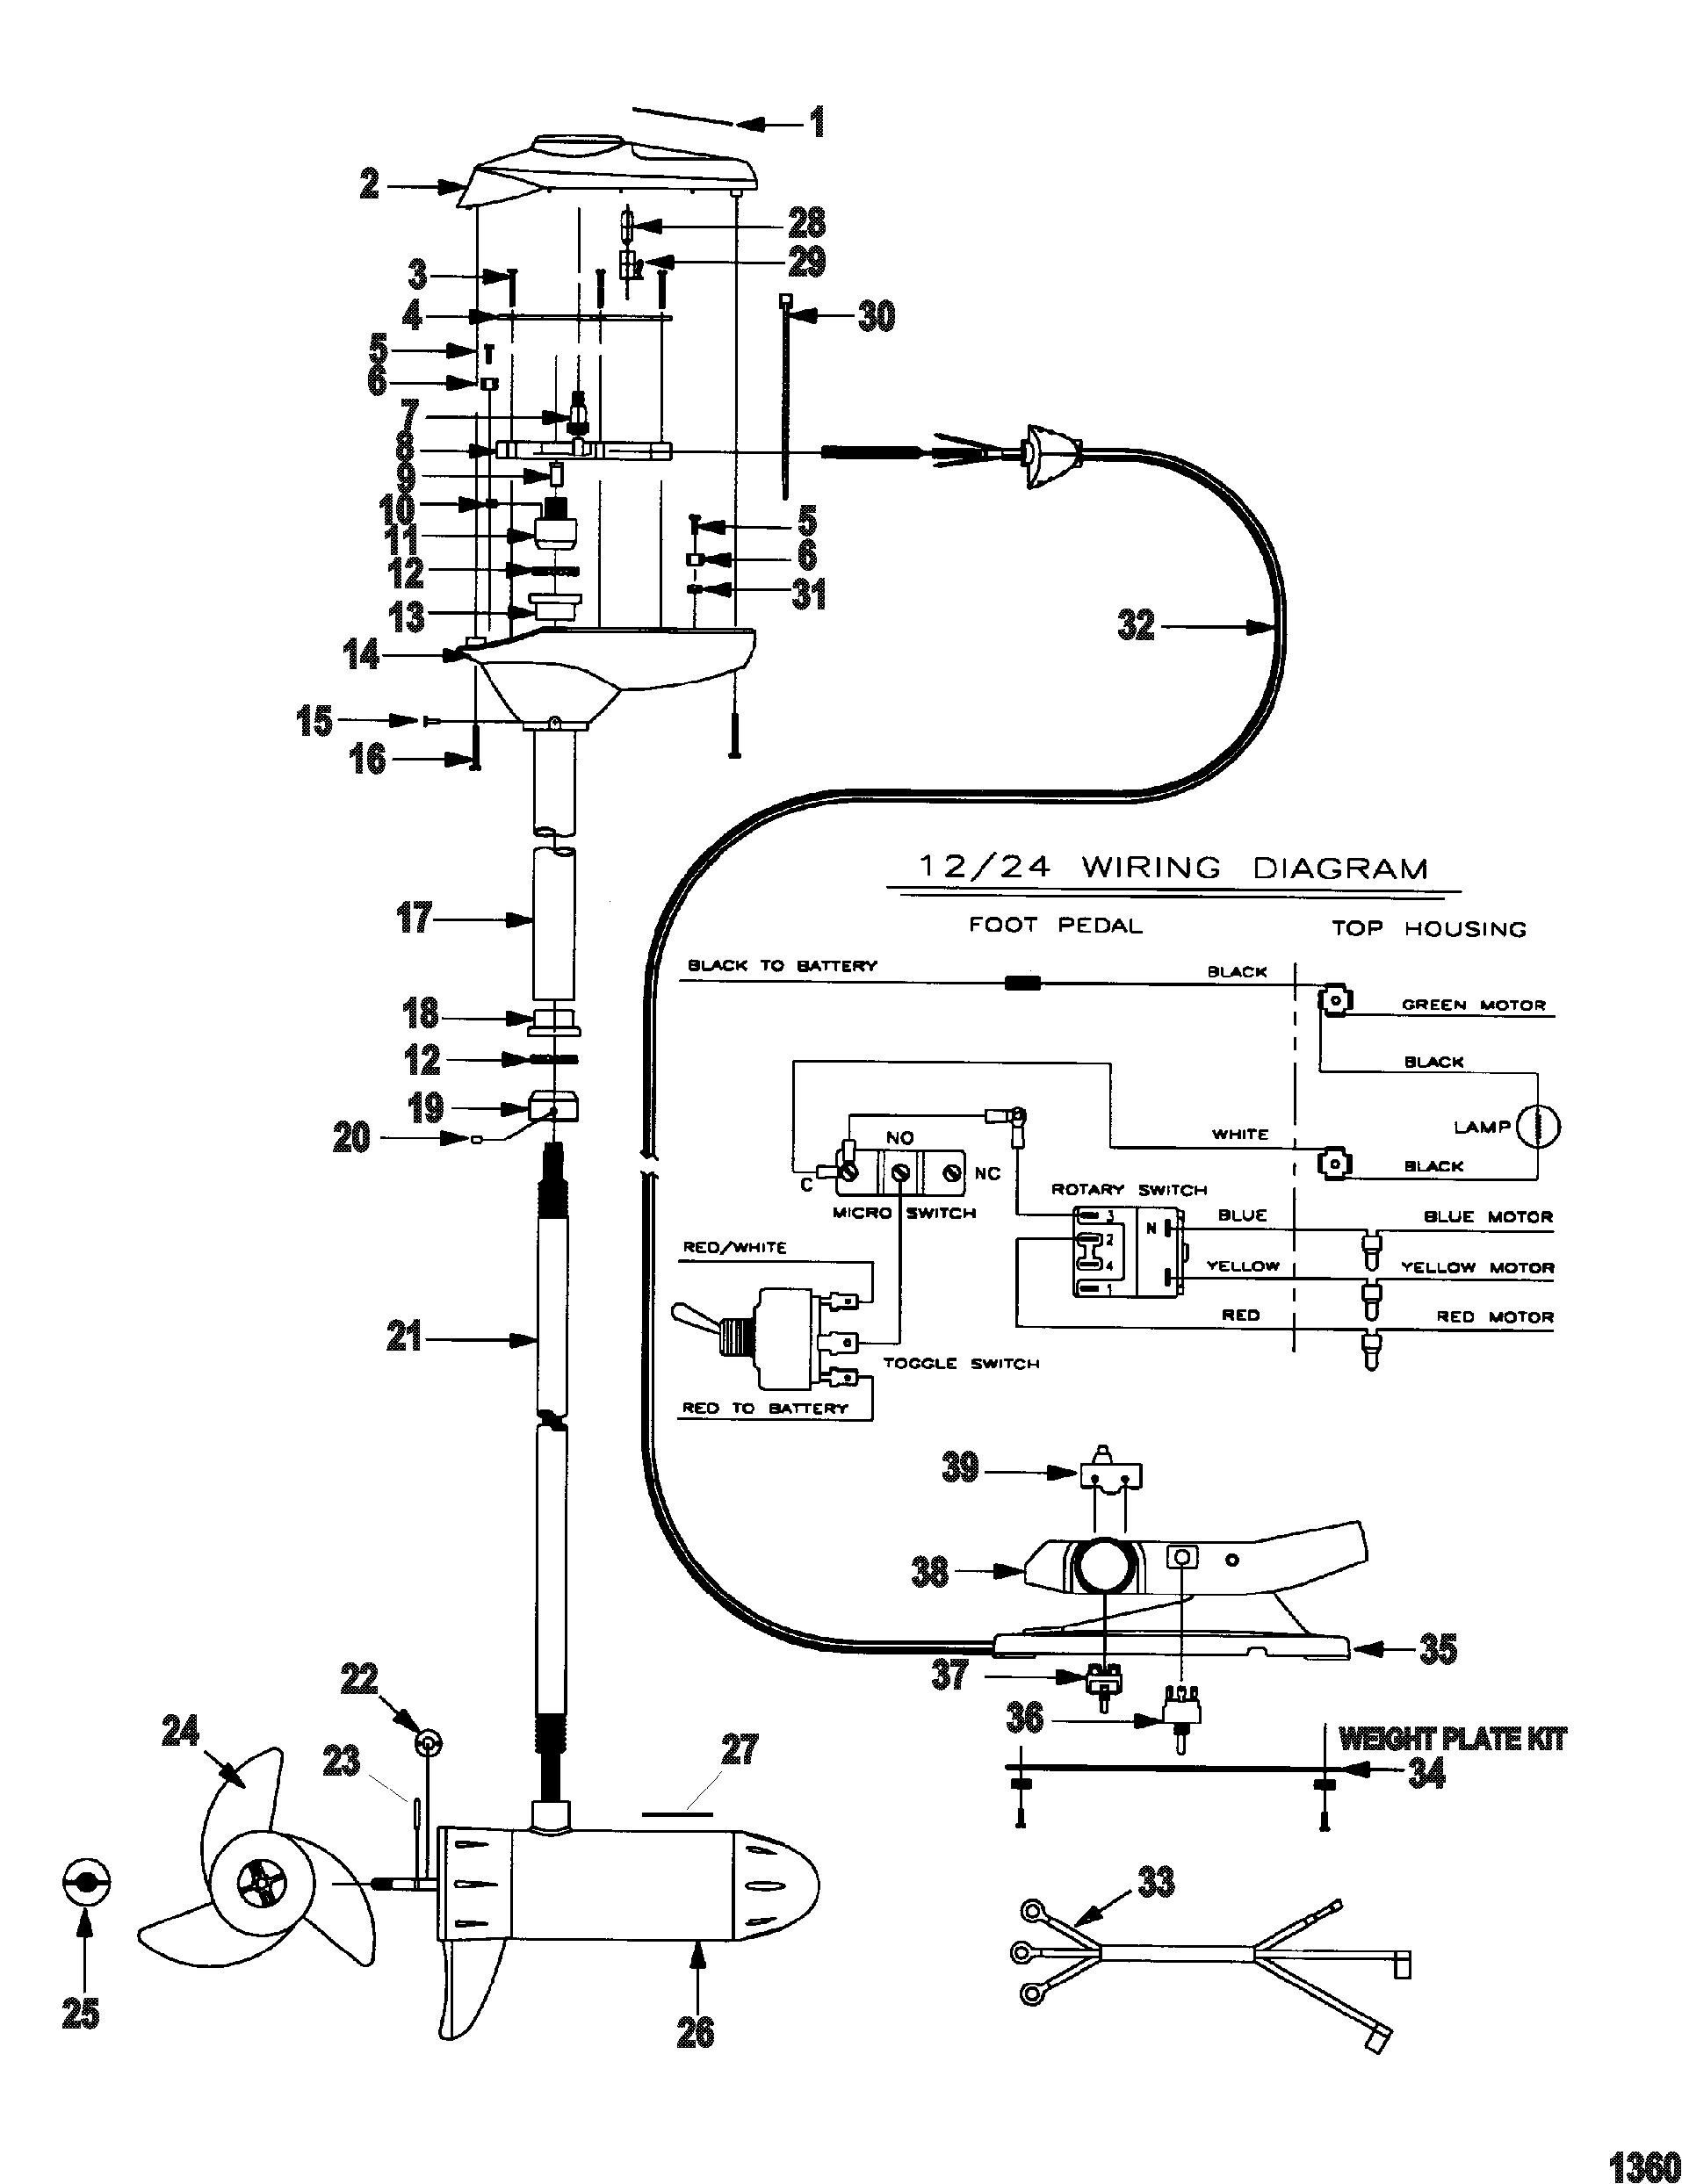 motorguide 24v trolling motor wiring diagram